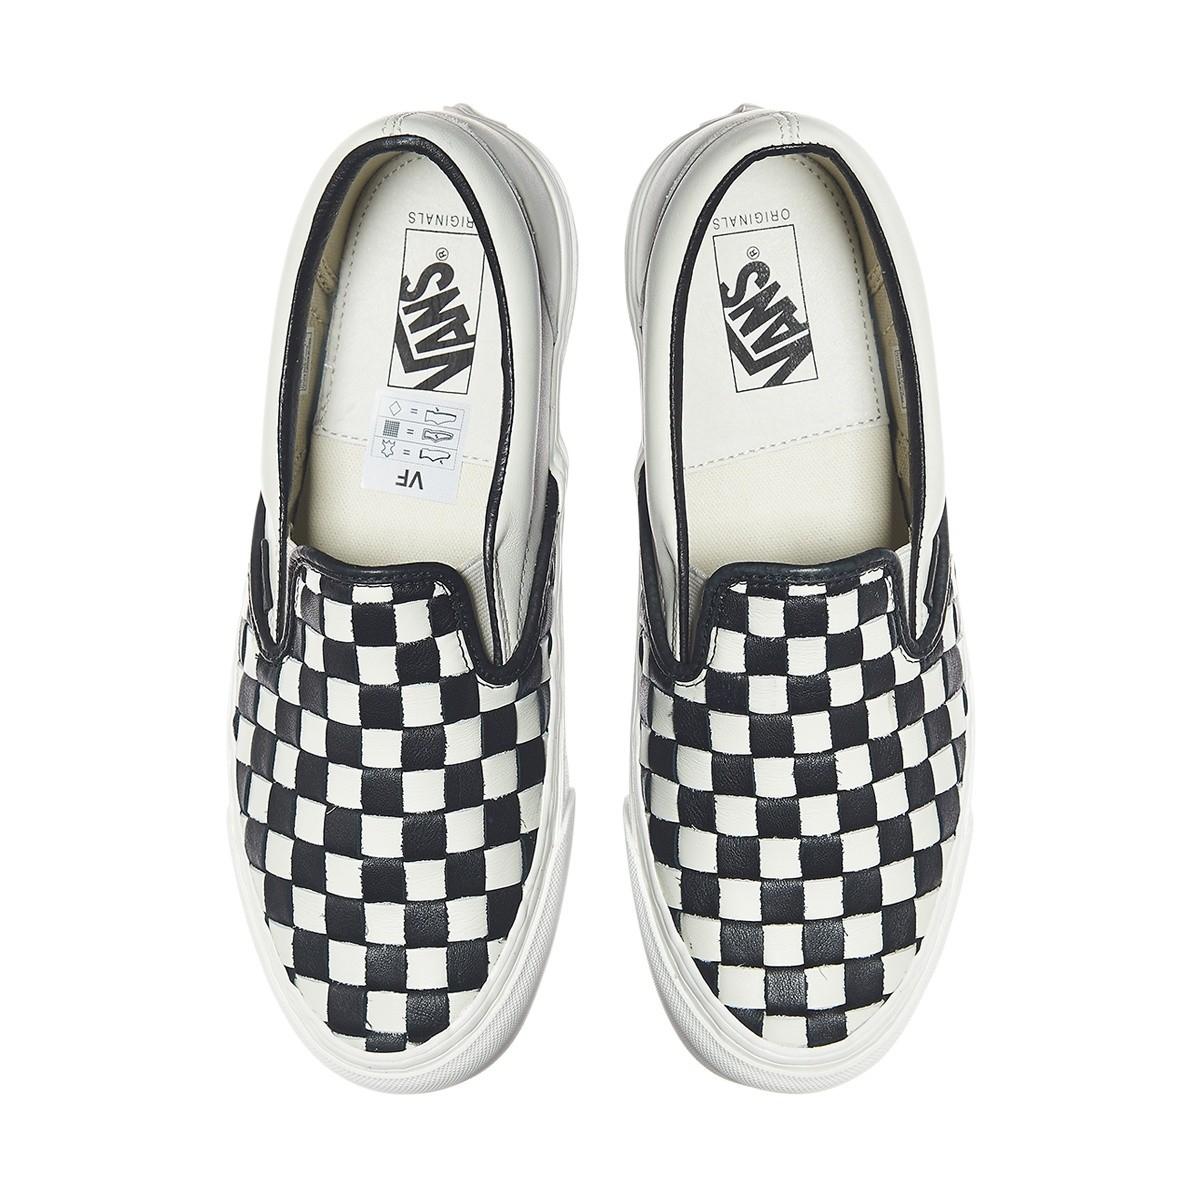 815252110b3 Lyst - Vans Og Classic Slip-on Lx 50th Checkerboard Anniversary ...